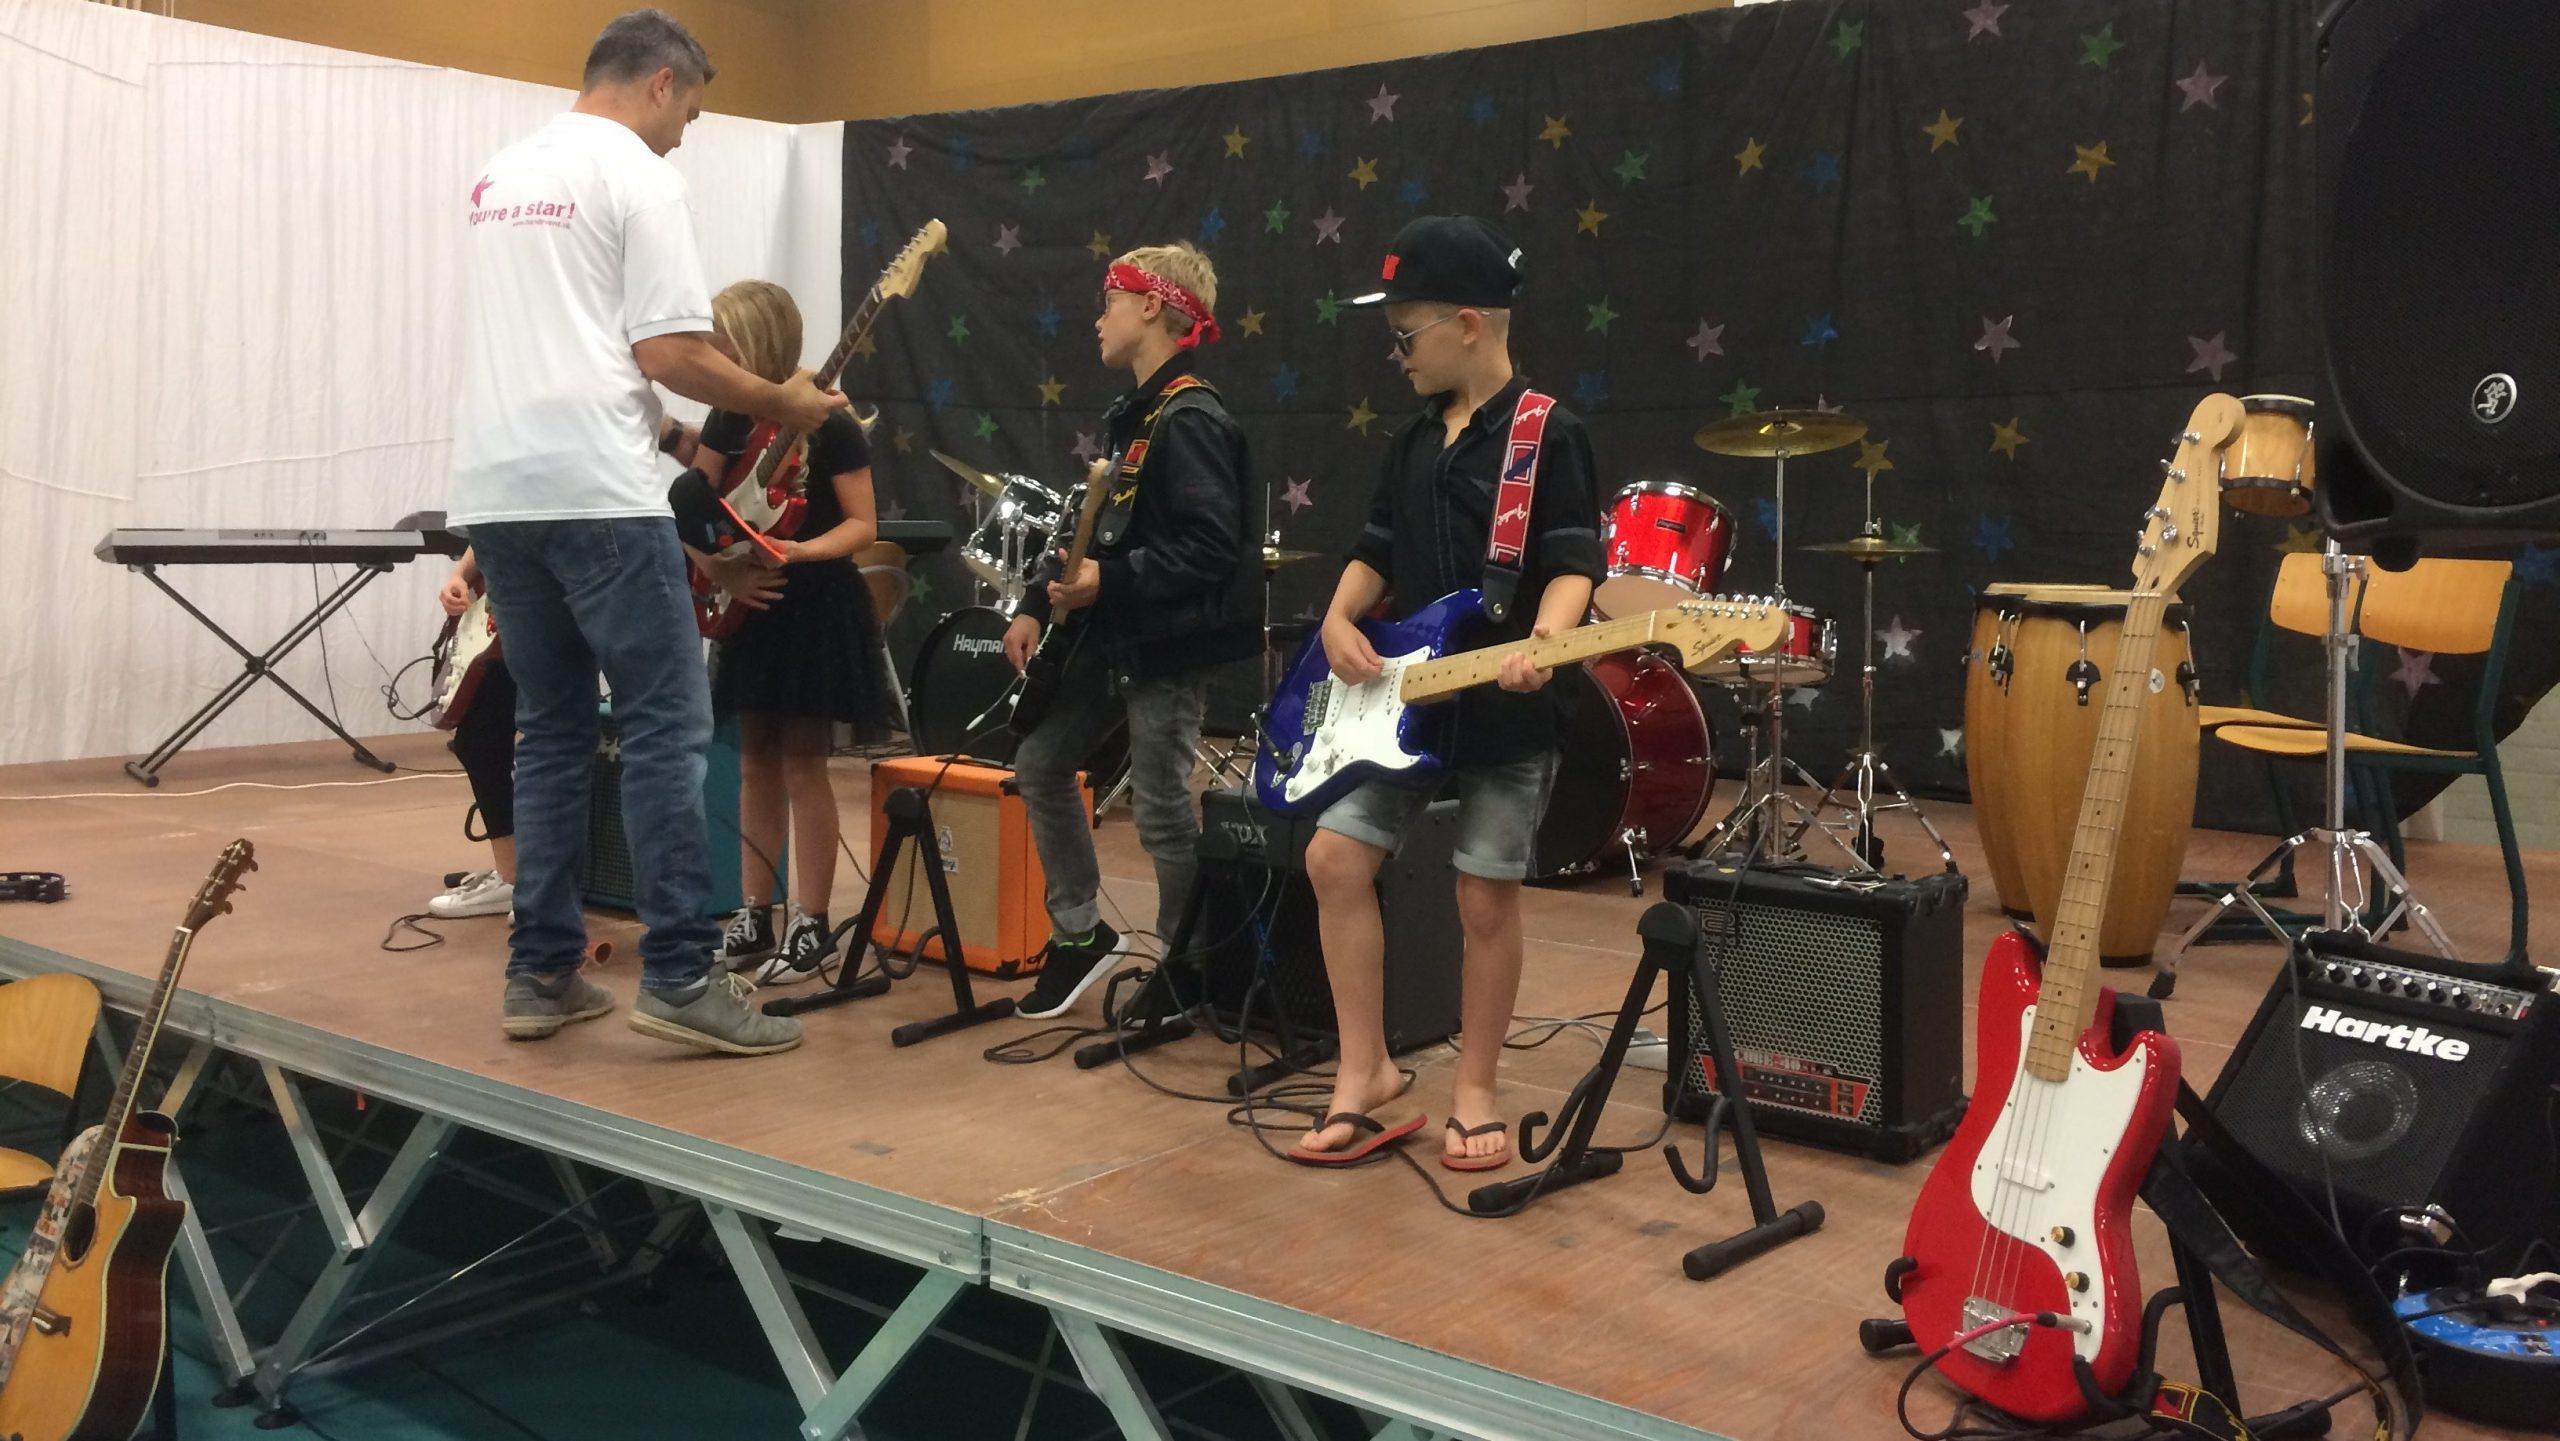 Dagproject basisschool muziek Fame 2